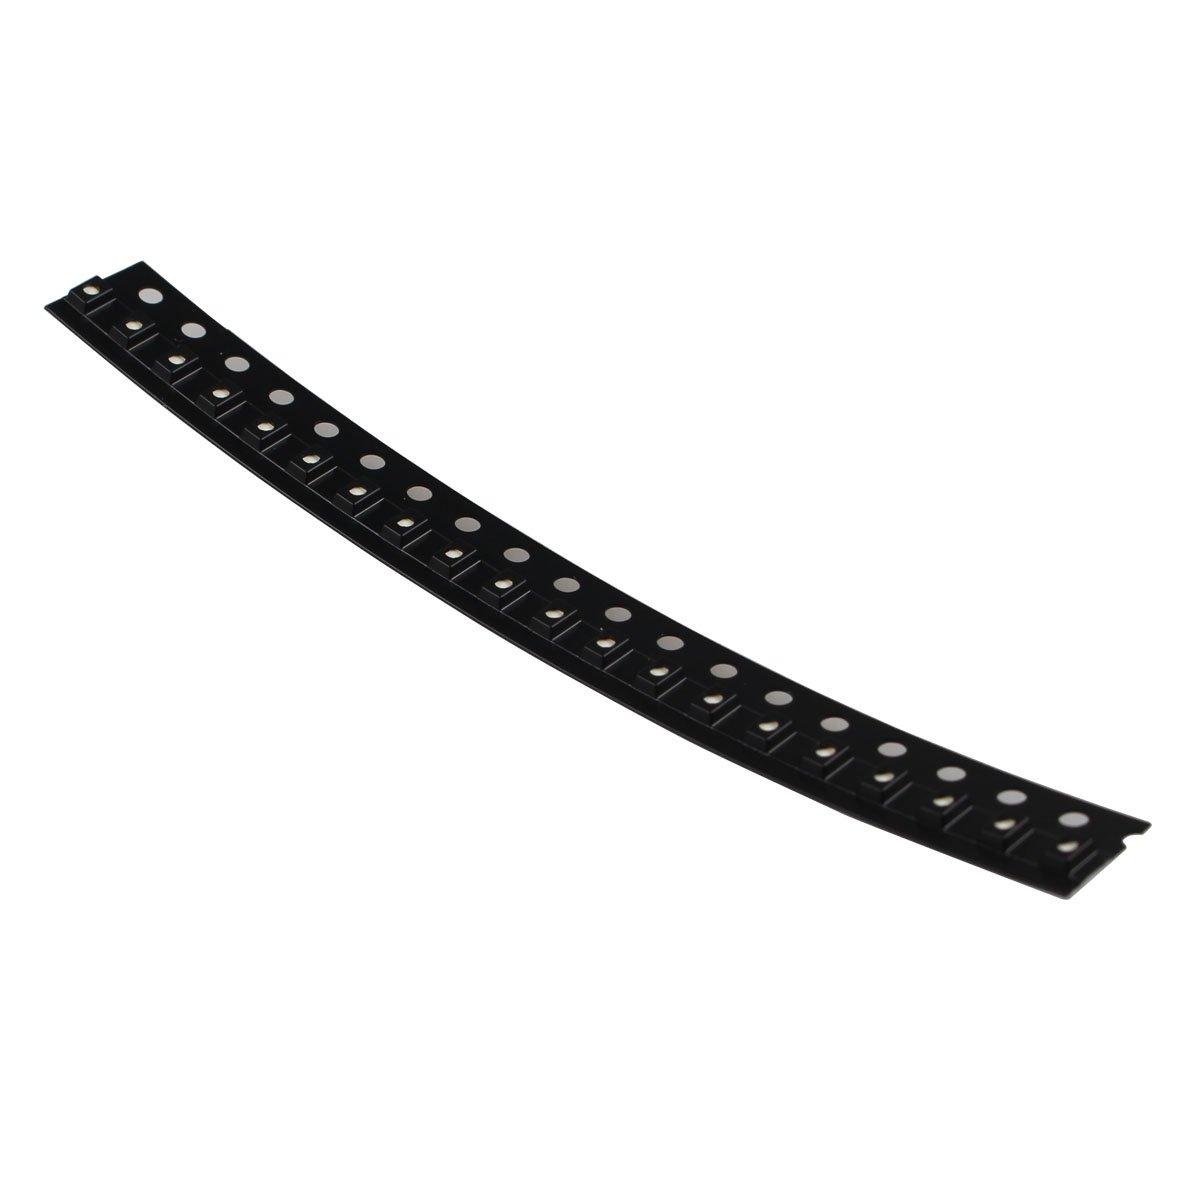 /Schwarz 0805/SMD LED rot//gelb//gr/ün//wei/ß//blau light-Emitting Diode Set/ 100/PCS